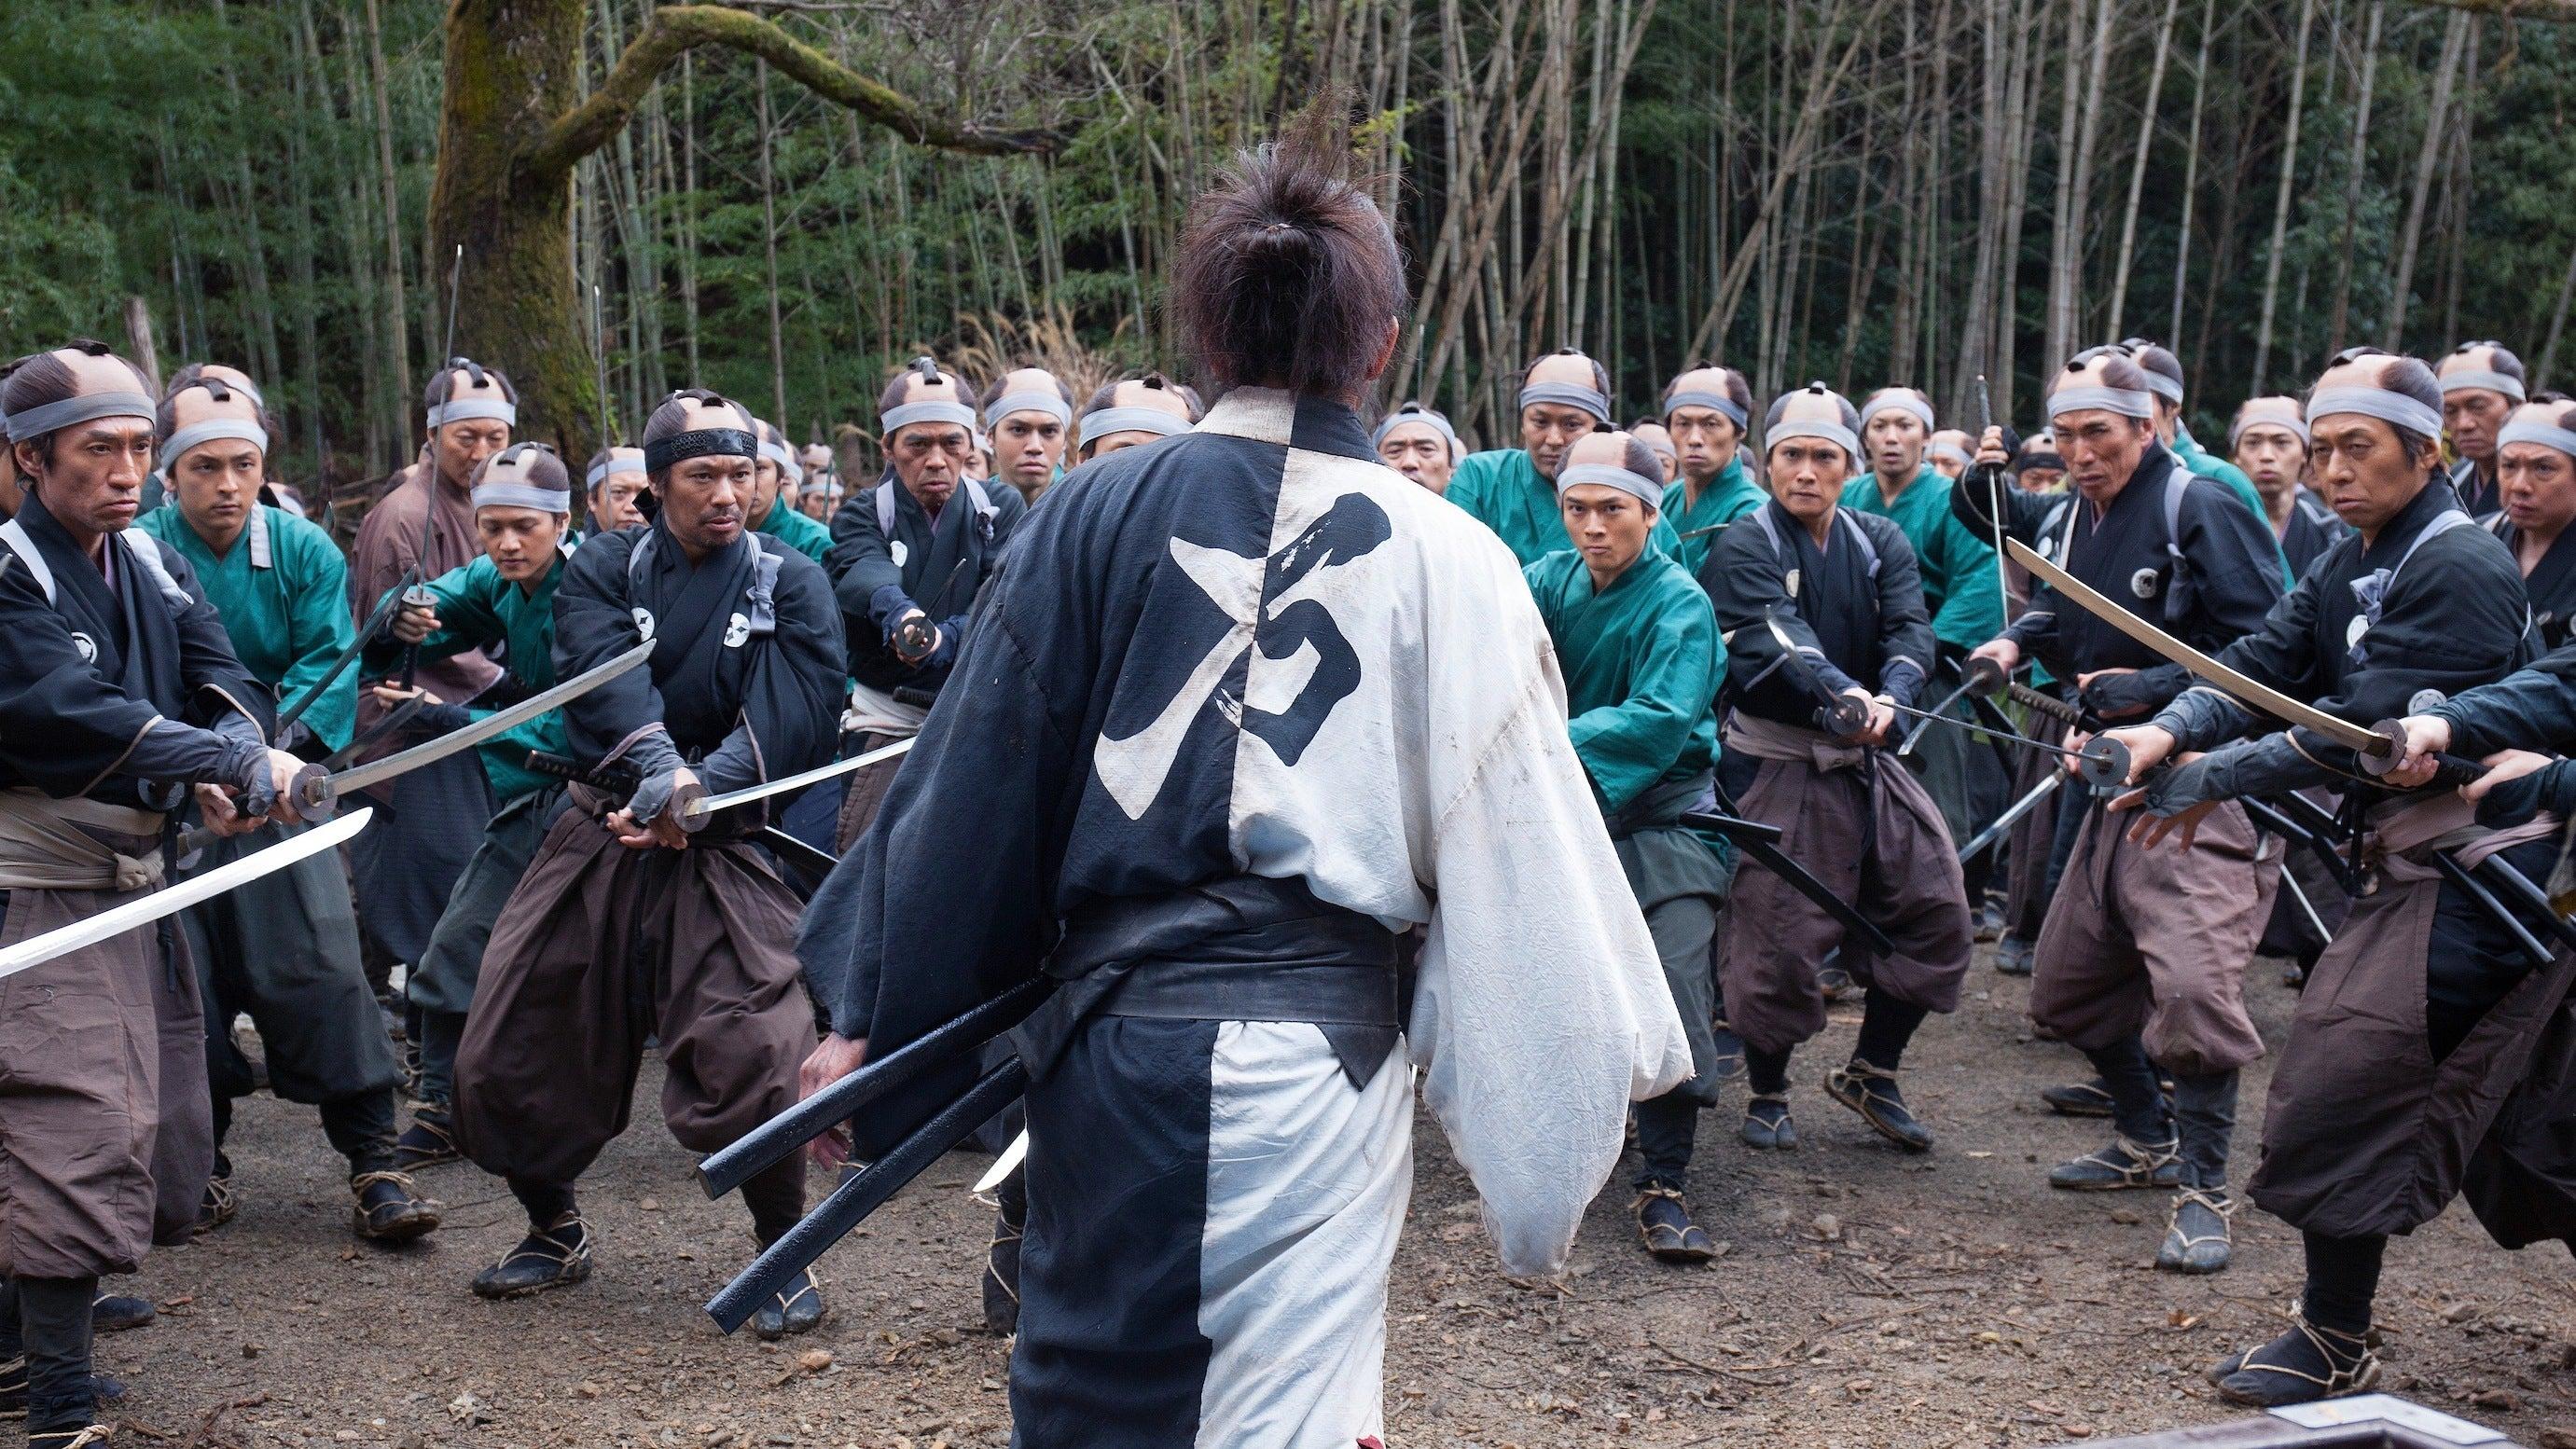 Takashi Miike's New Movie About An Immortal Samurai Looks Bananas